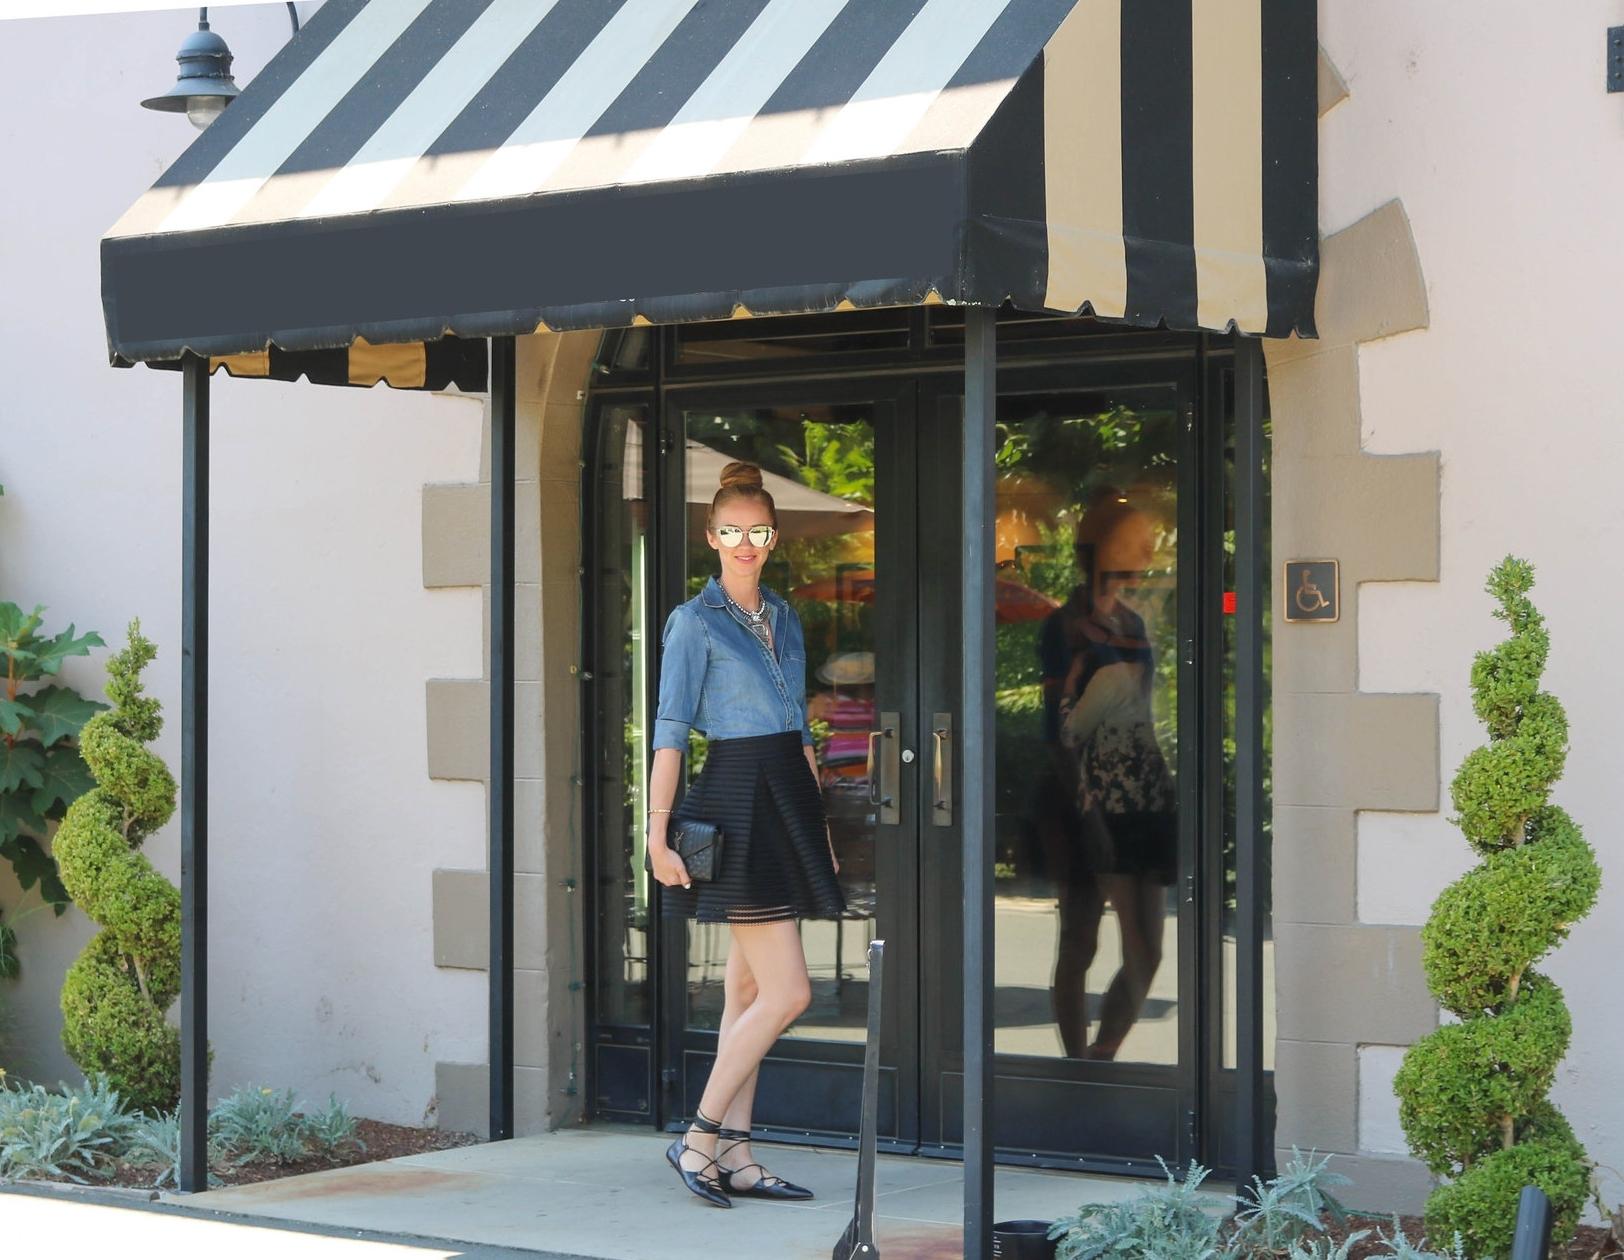 street-style-blogger-banana-republic-denim-shirt-black-lace-up-flats